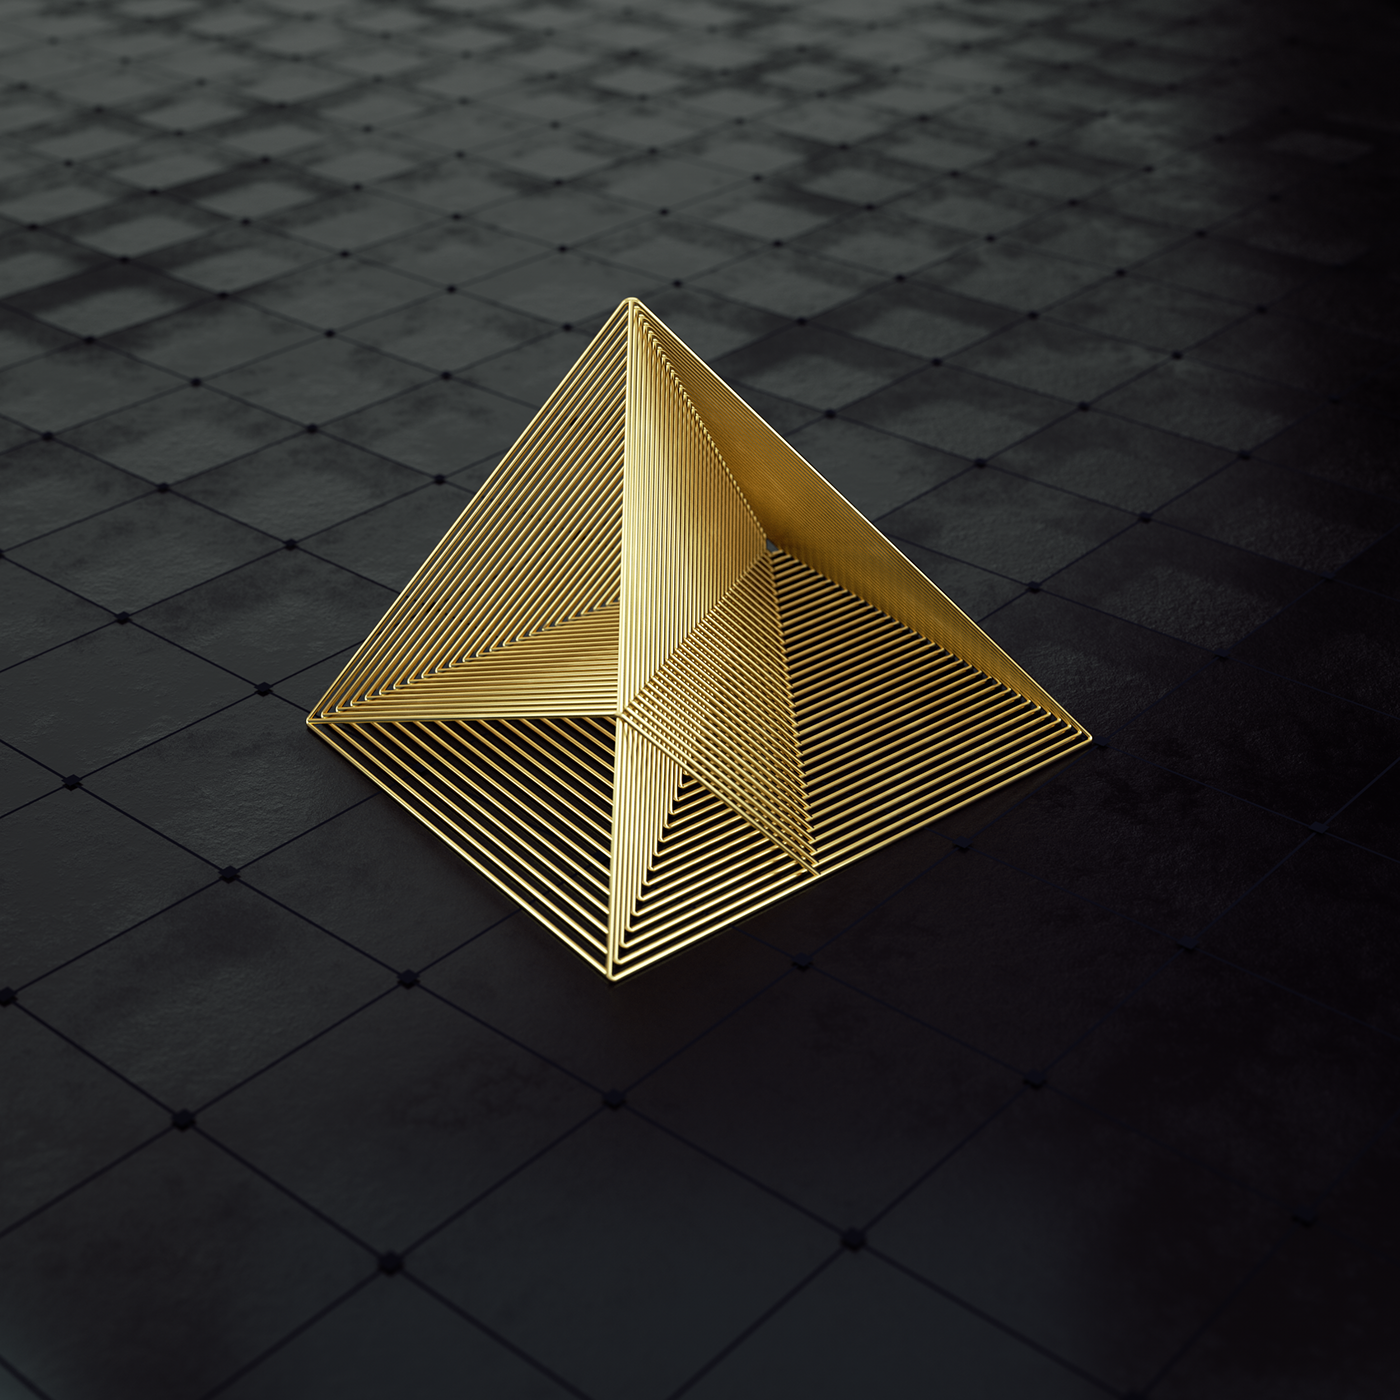 logo CGI Variations dailyart octane X-paticles snow gold materials camfrae